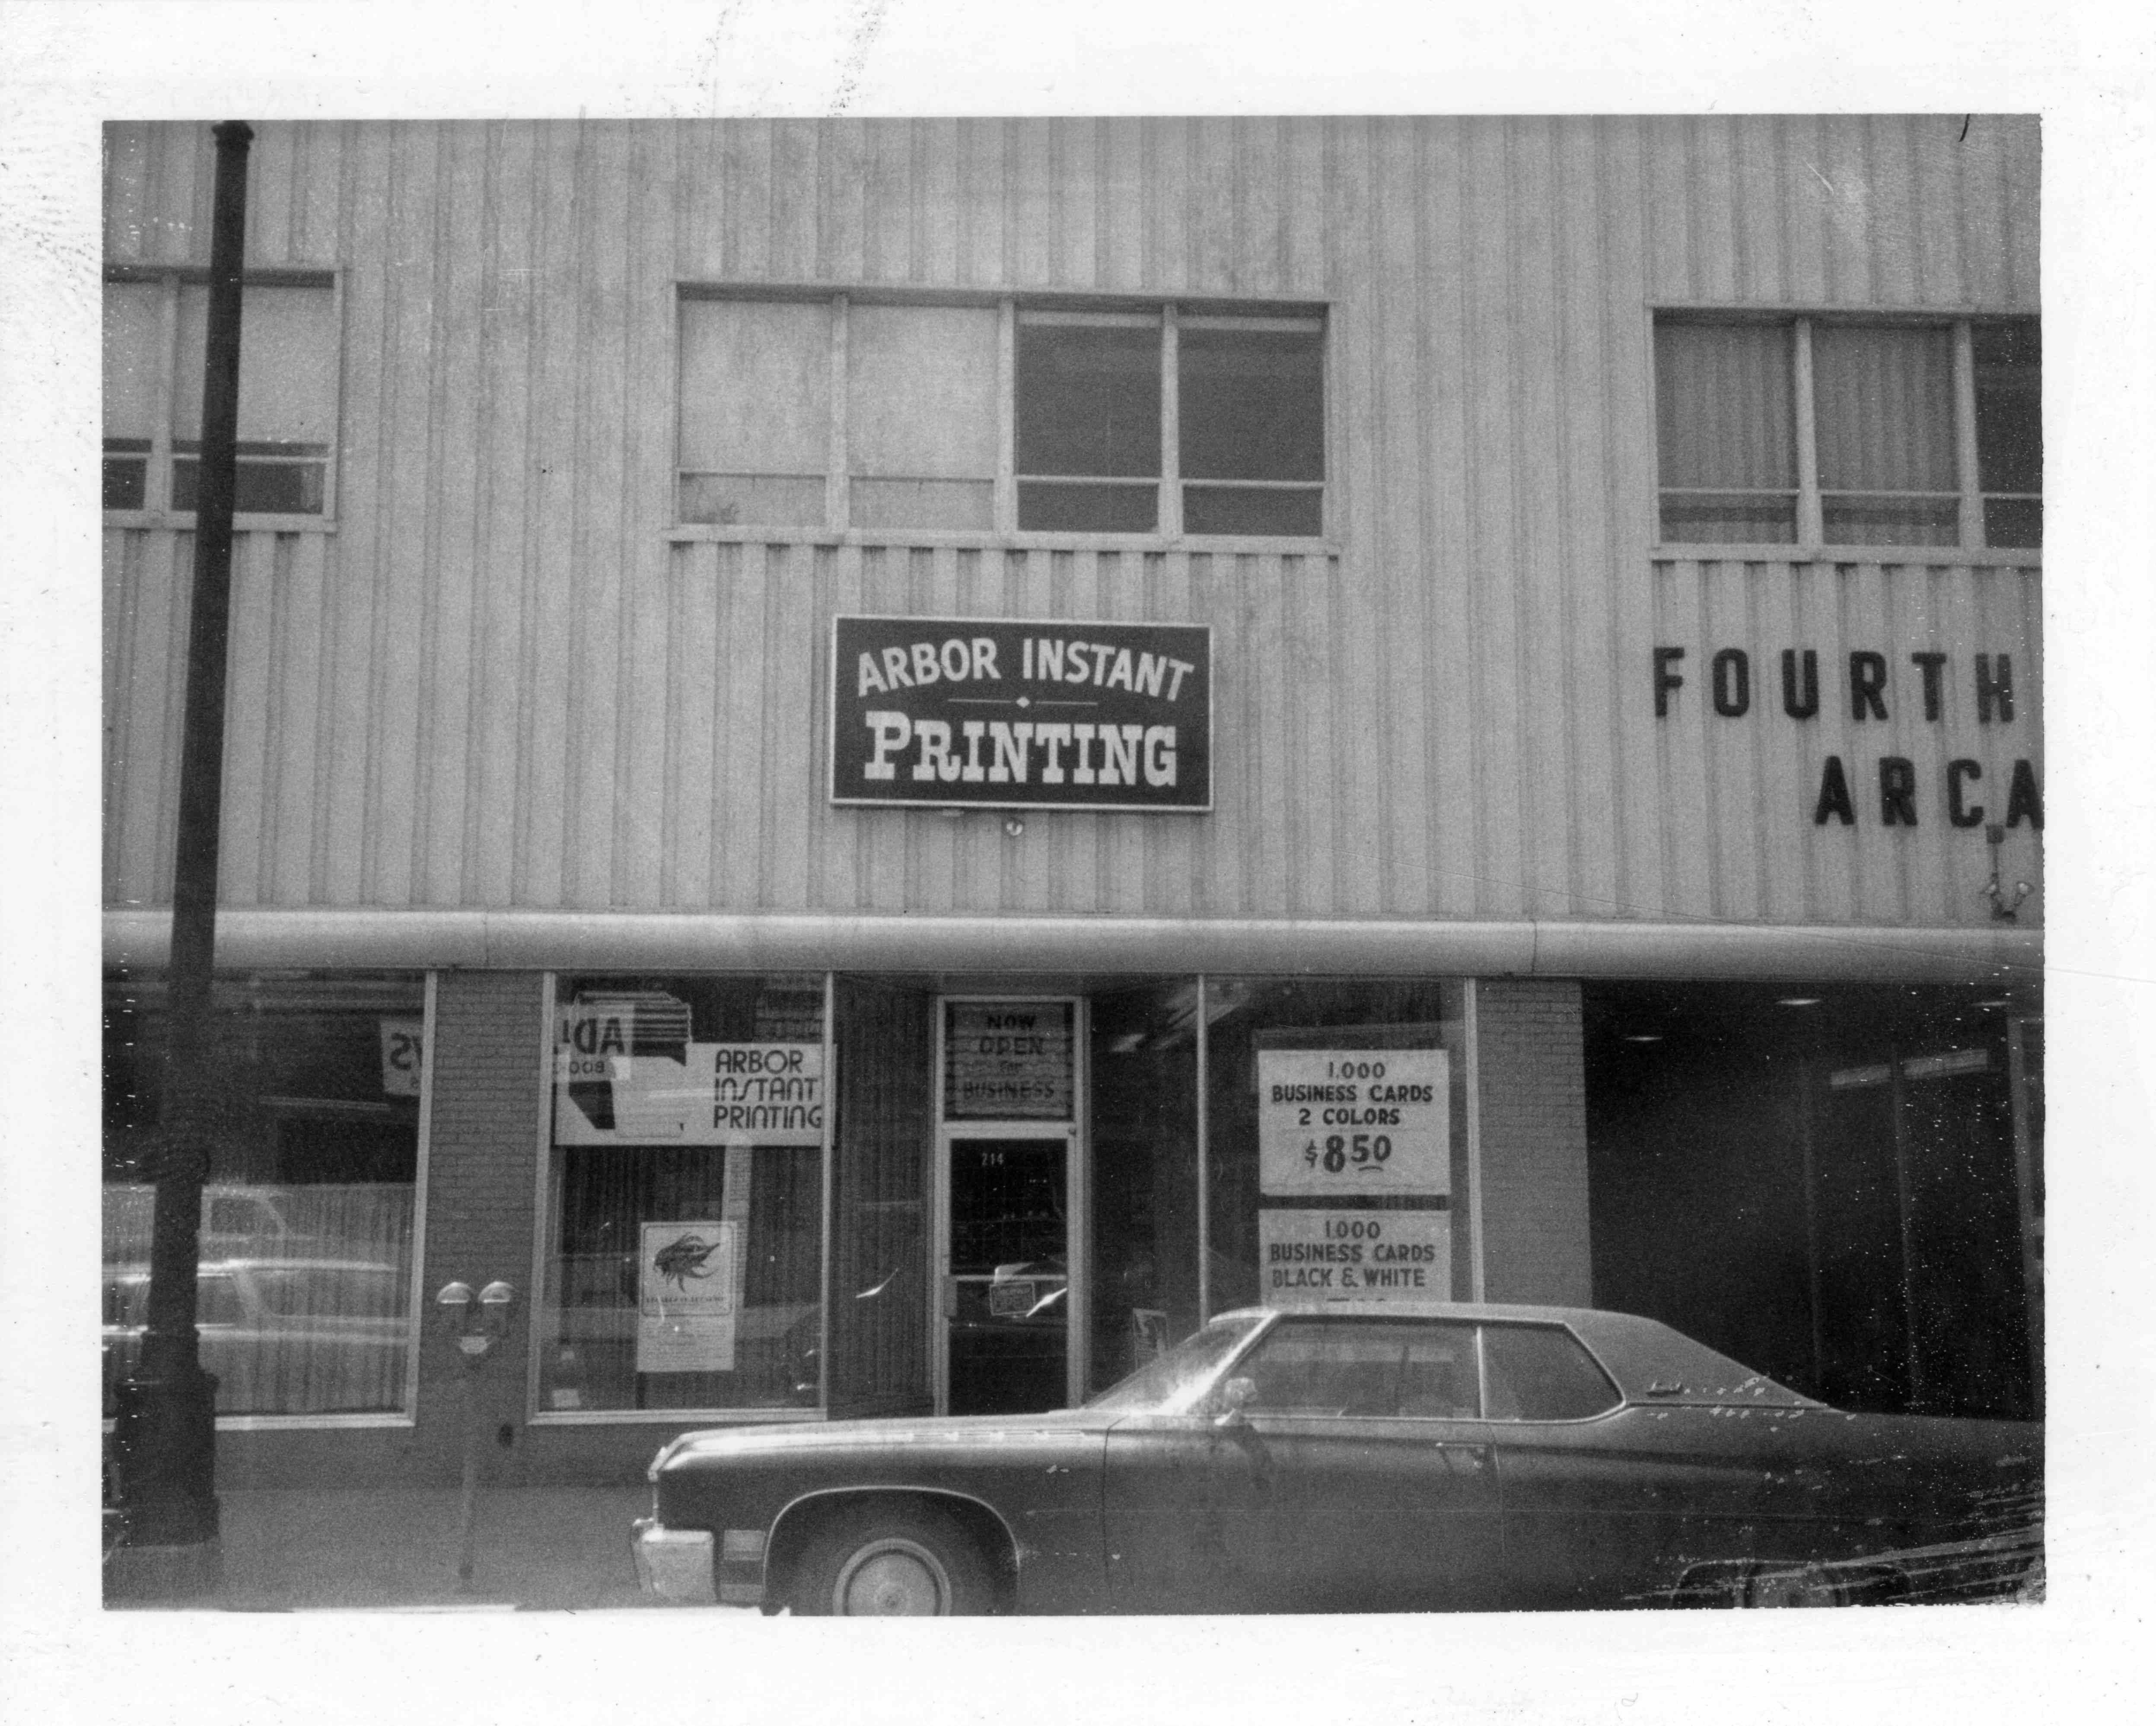 Arbor instant printing 1974 ann arbor district library arbor instant printing 1974 reheart Images